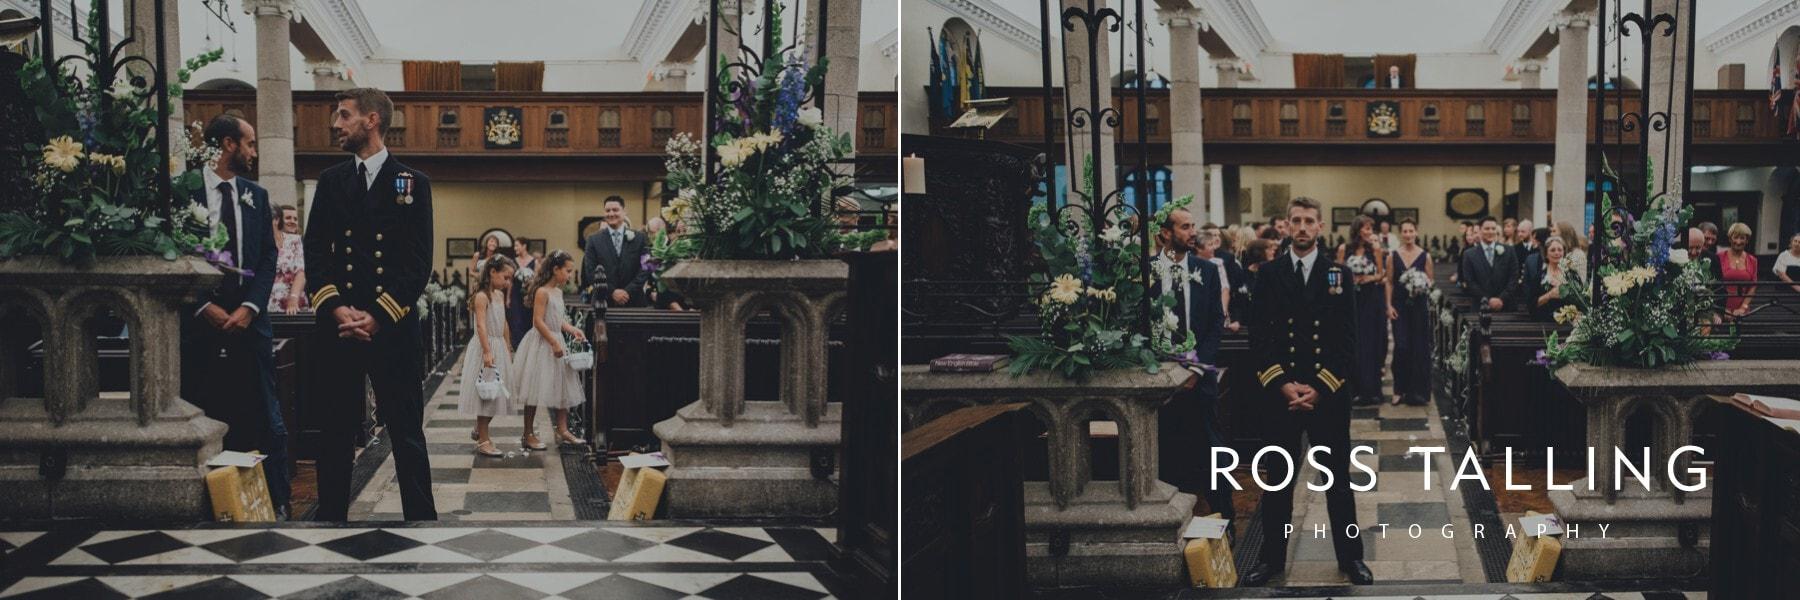 lorrie-gareths-wedding-photography-cornwall_0070